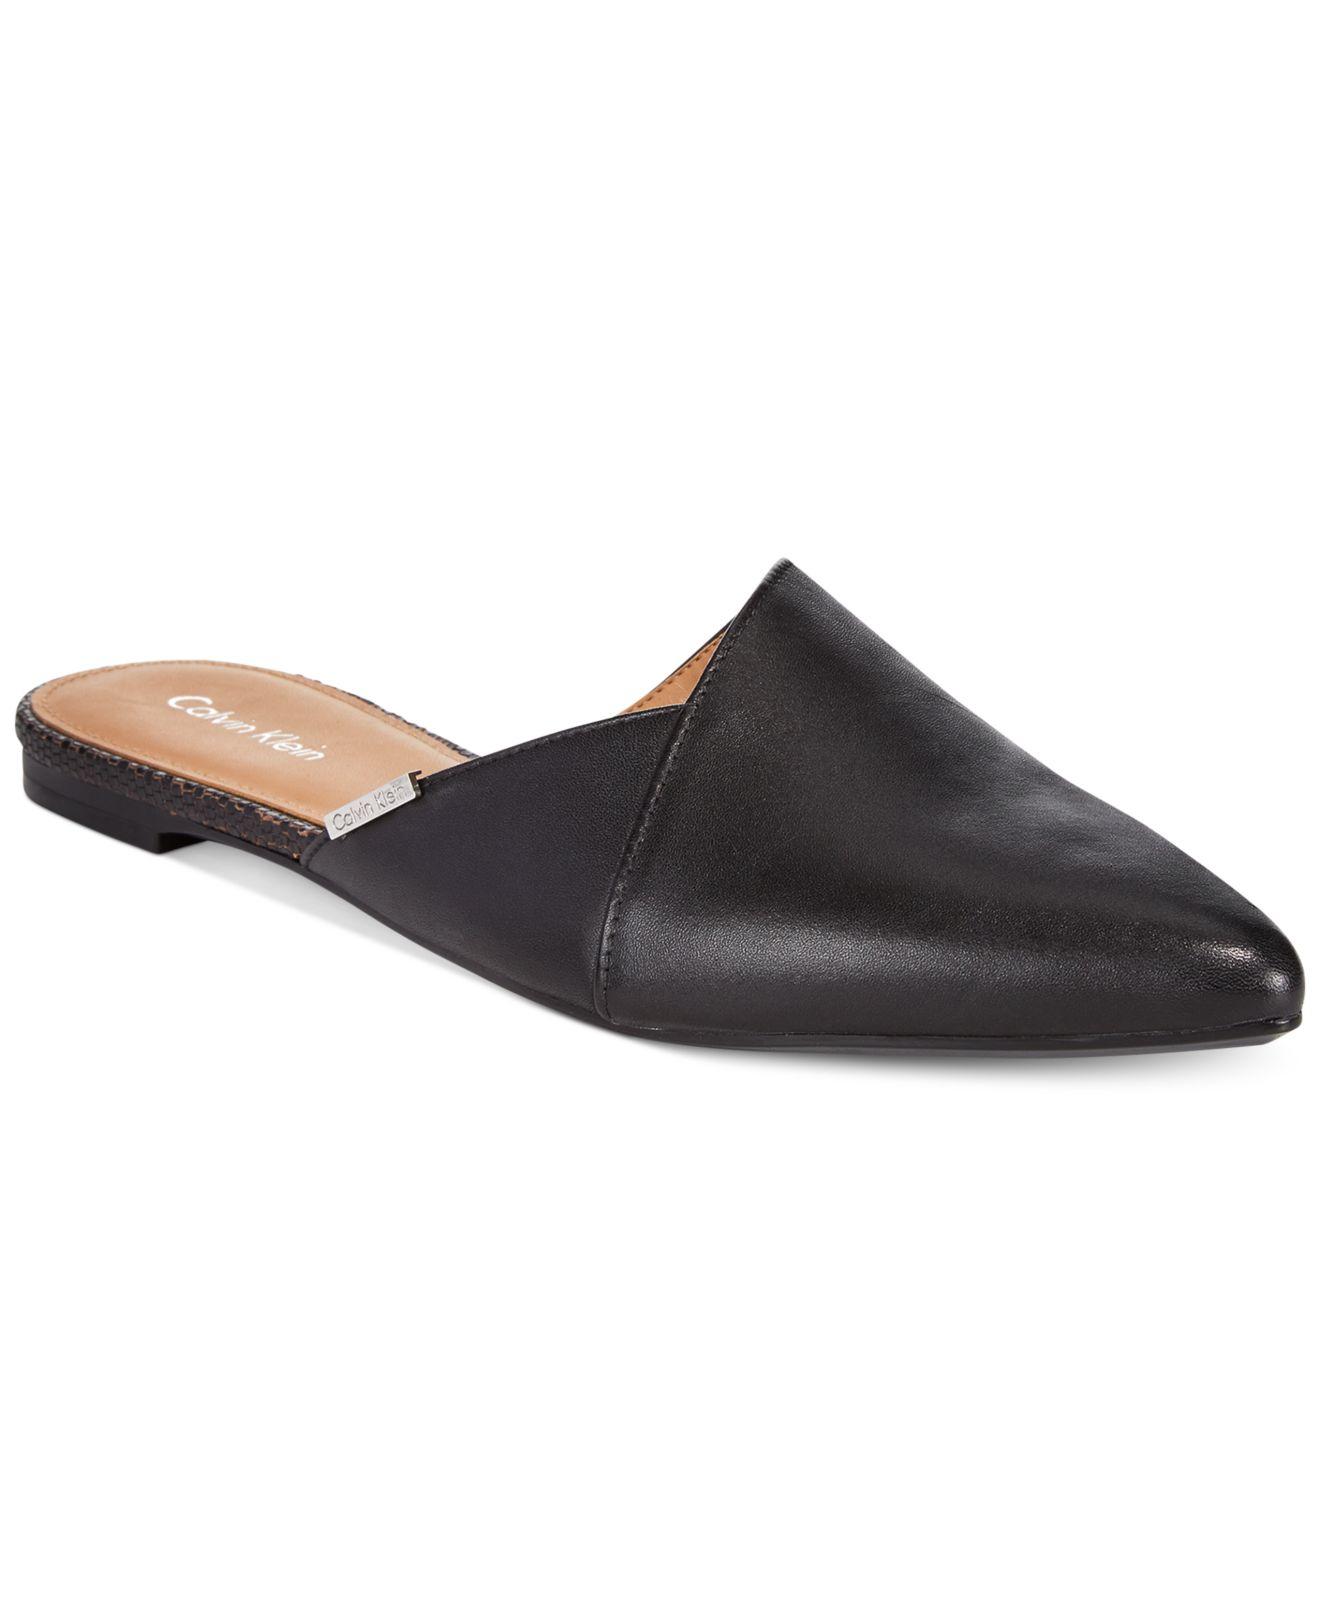 Calvin Klein Garnett Flats In Black (Black Leather)